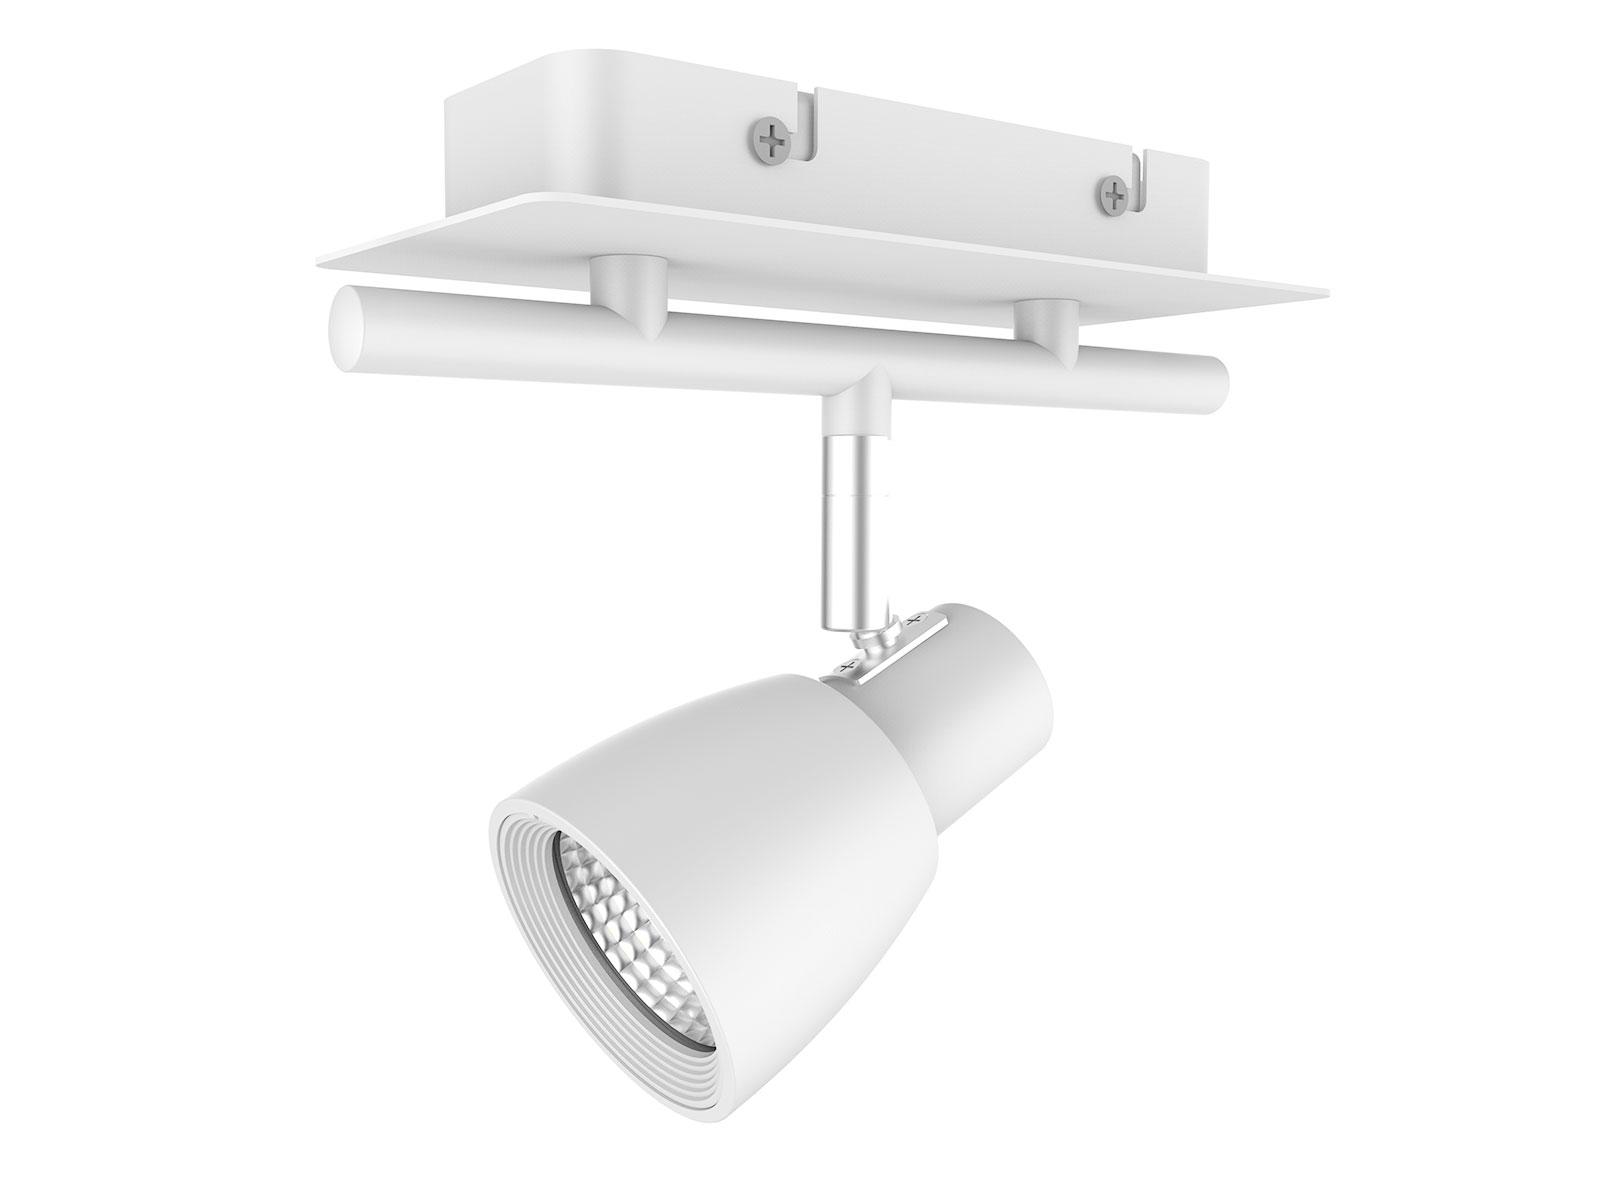 10w wall mounted track lighting